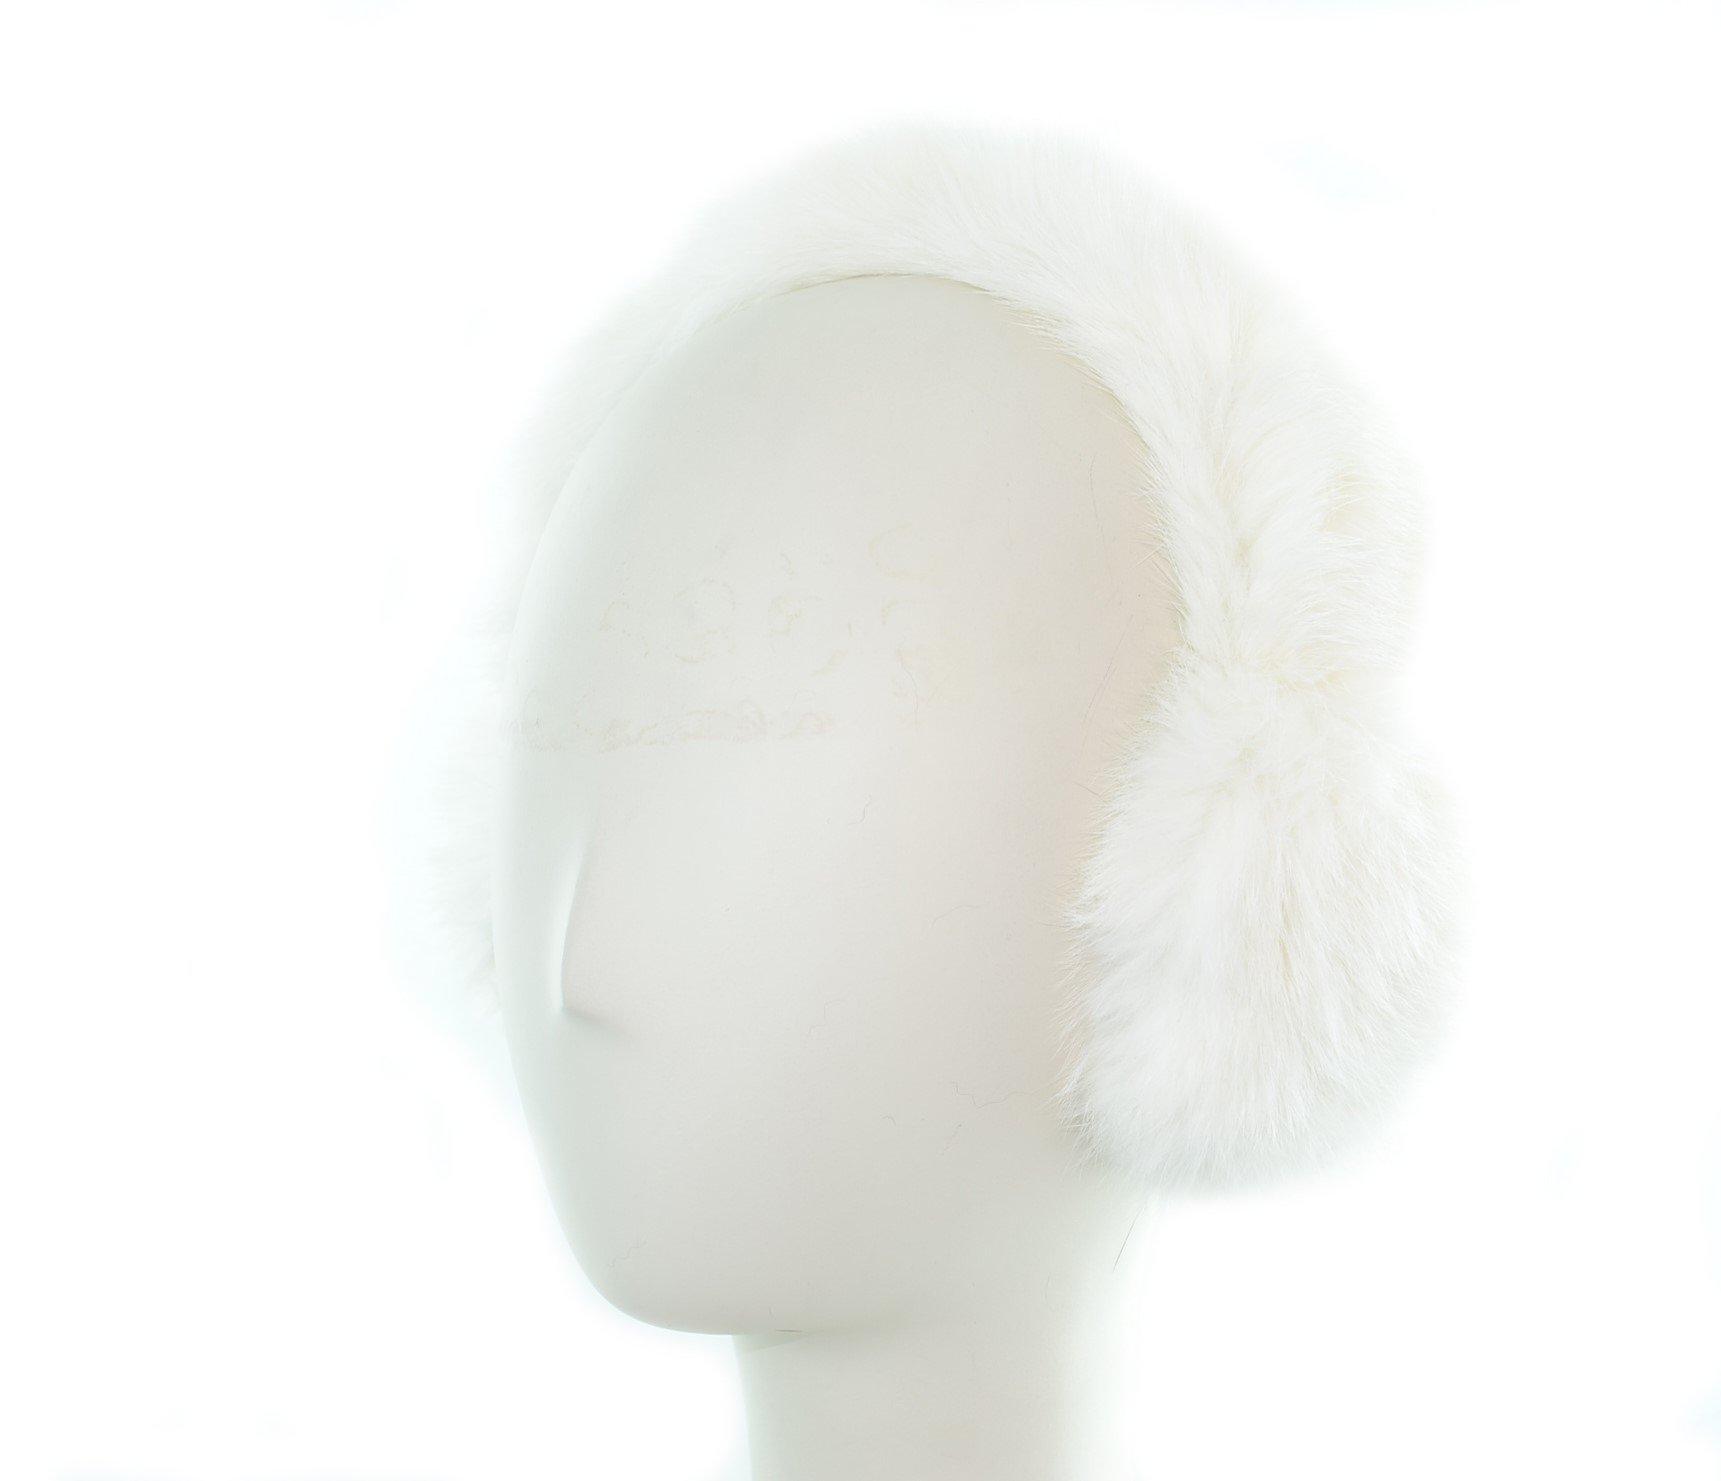 Surell Genuine White Soft Rabbit Fur Earmuffs with All Fur Non Adjustable All Fur Head Band - Winter Fashion Ear Warmers - Perfect Elegant Women's Luxury Gift